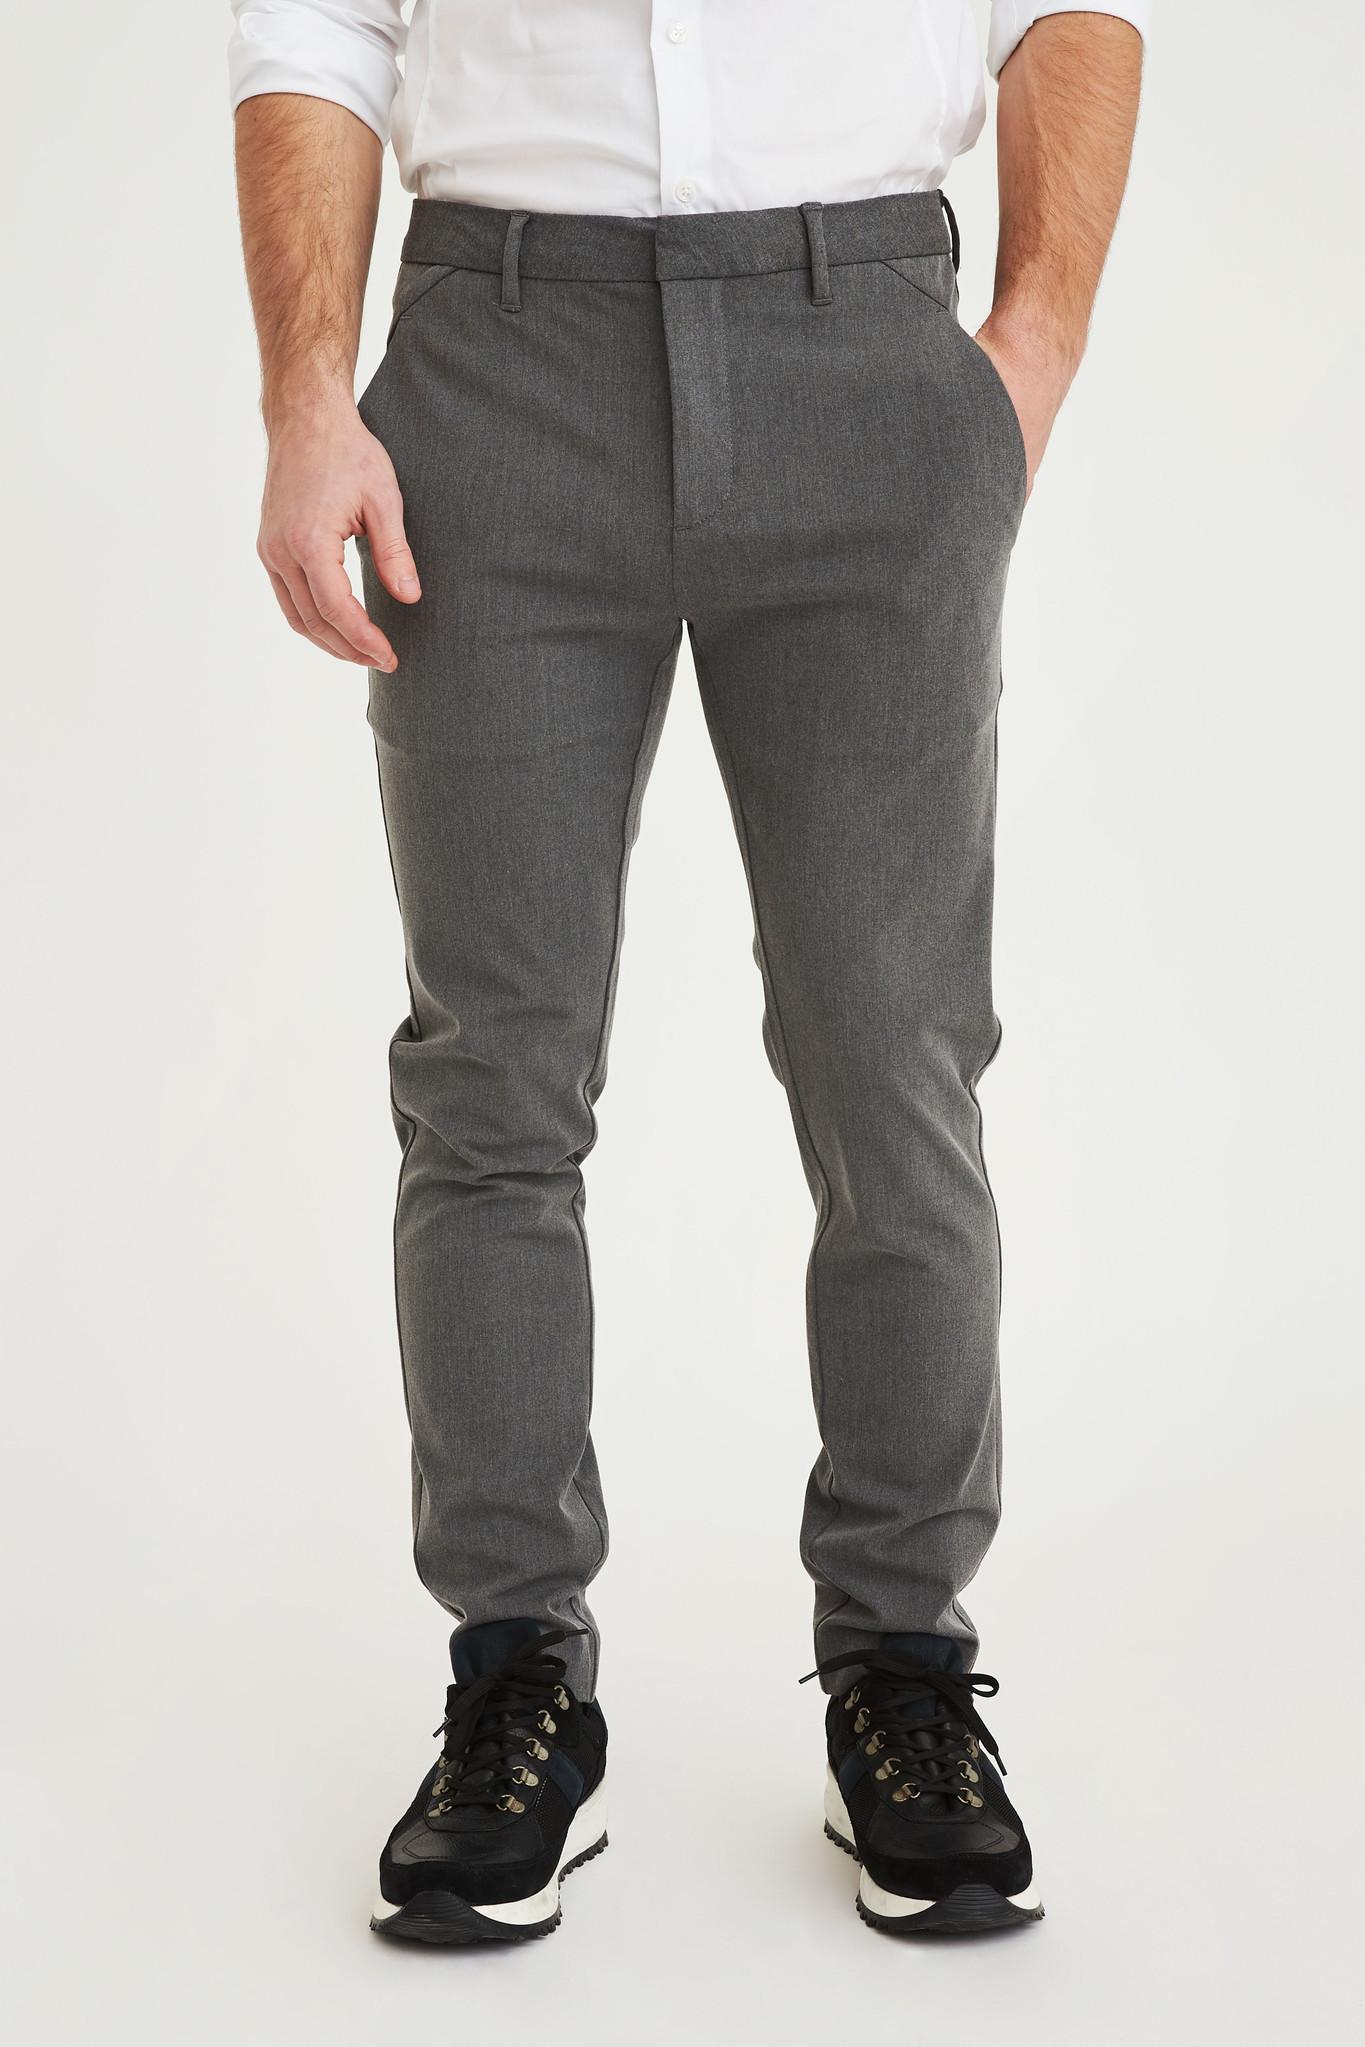 Plain Broek Plain Josh 315-2144 Grey